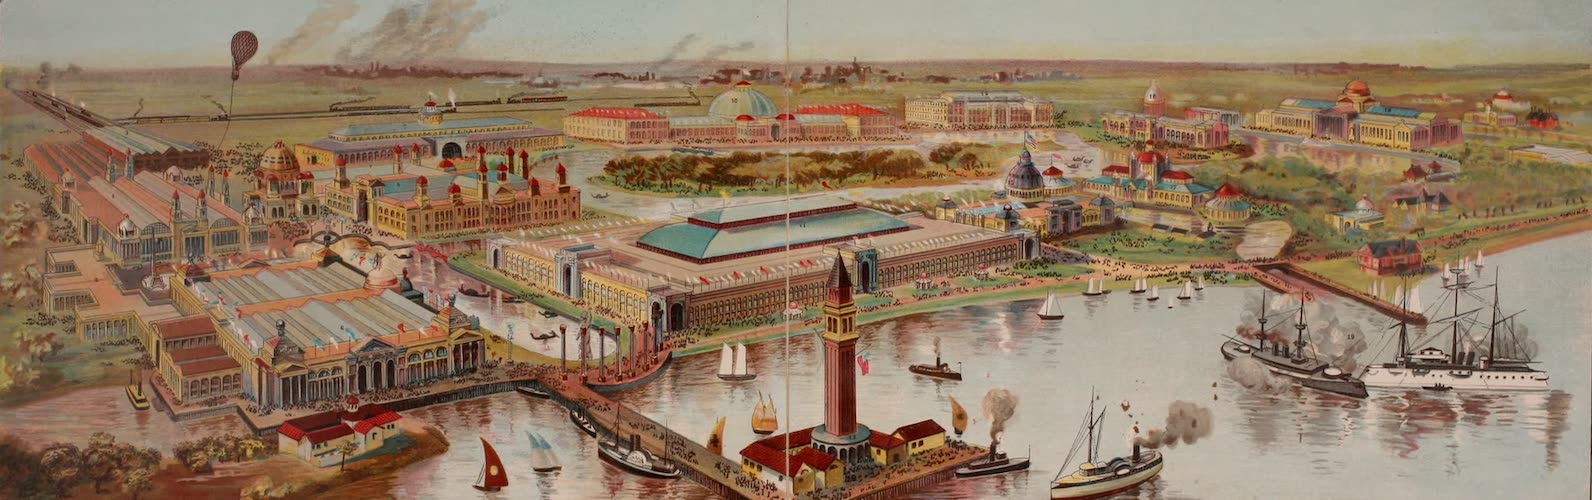 Columbus and Columbia - Panoramic View of the Columbian Exchange (1892)